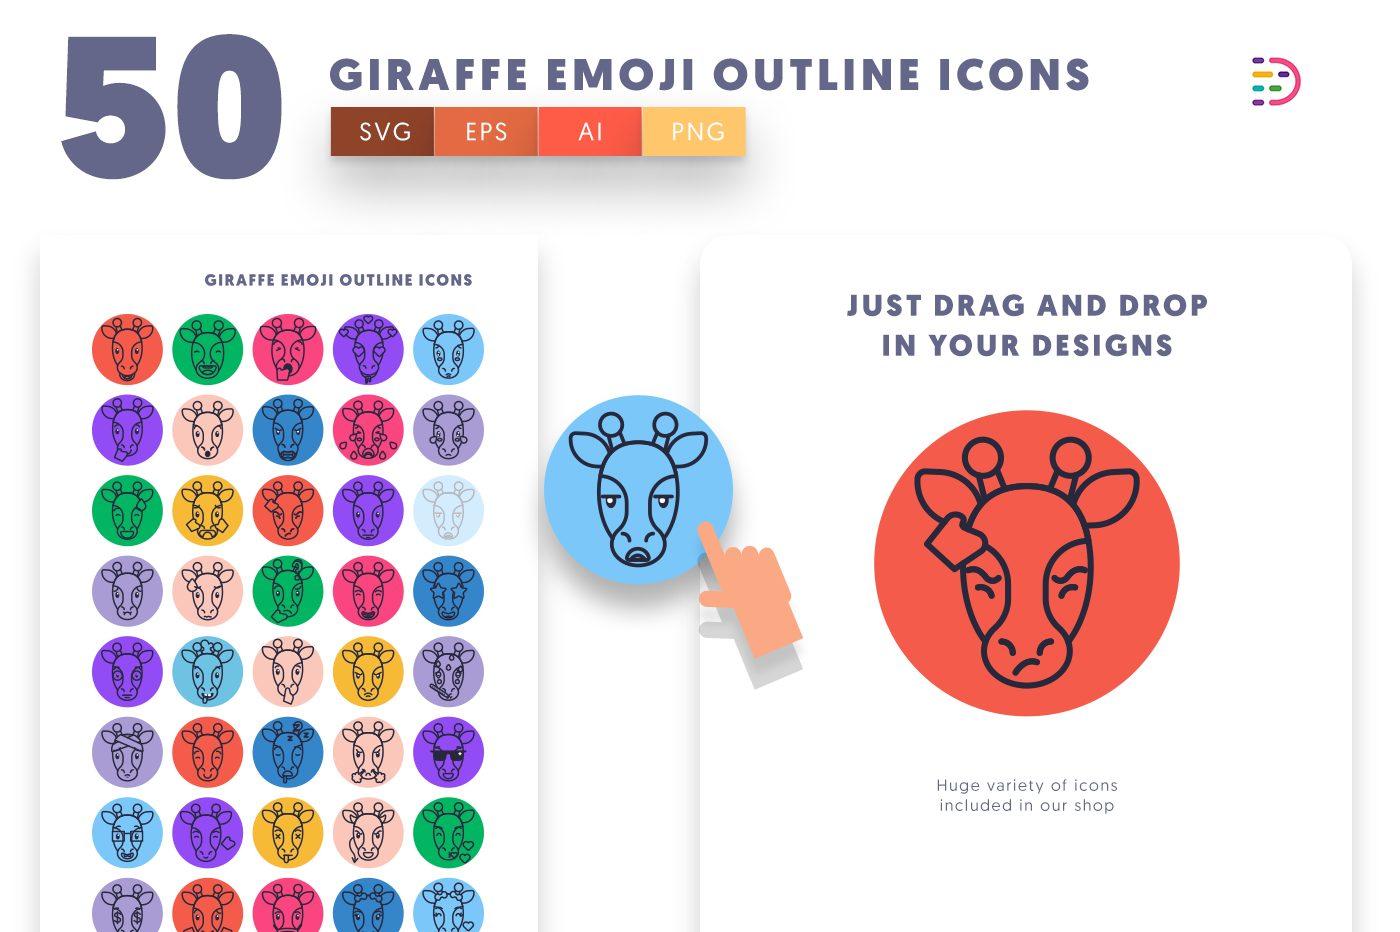 Drag and drop vector 50 Giraffe Emoji Outline Icons